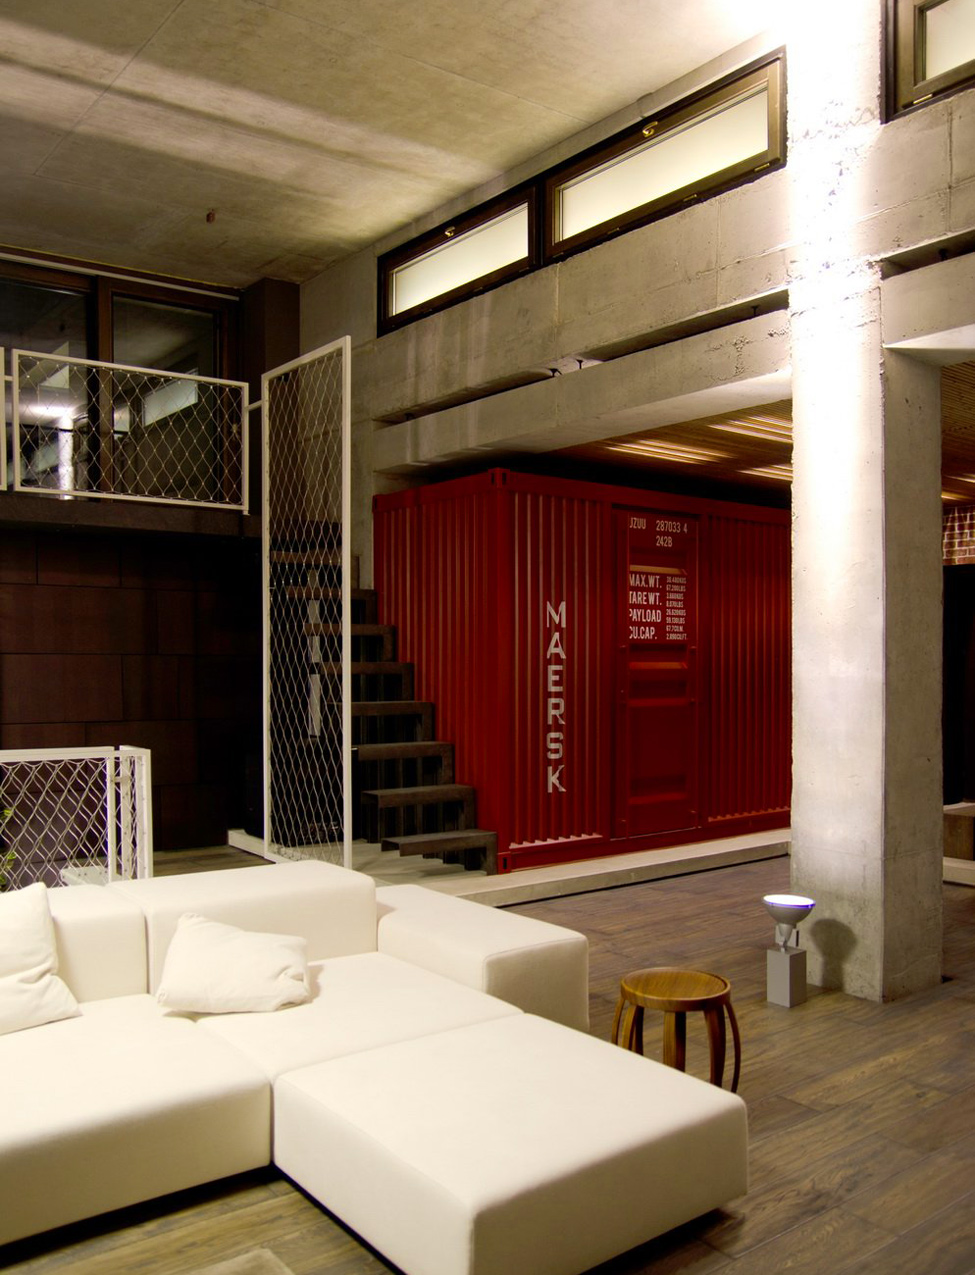 Industrial Home Decor Living Room: Industrial Decor Design